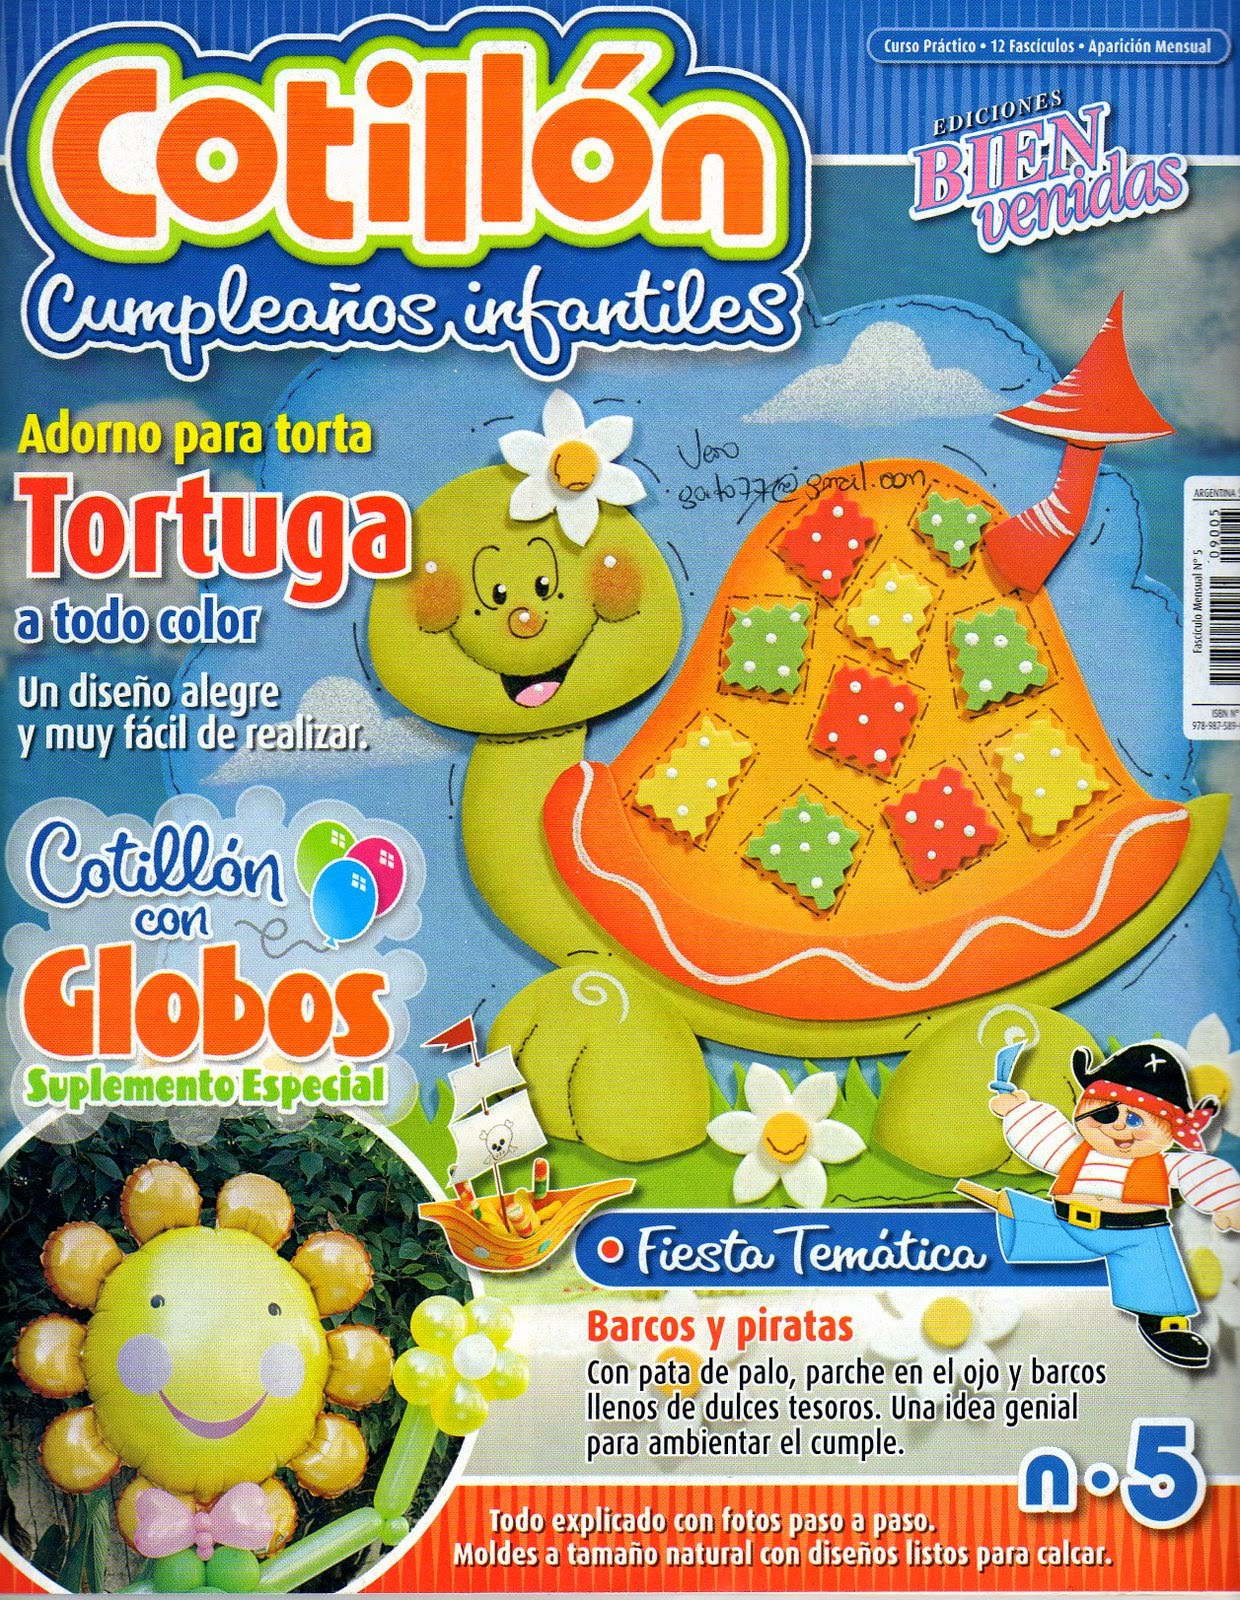 Cumplea os infantiles cotill n revistas de for Revistas de decoracion gratis